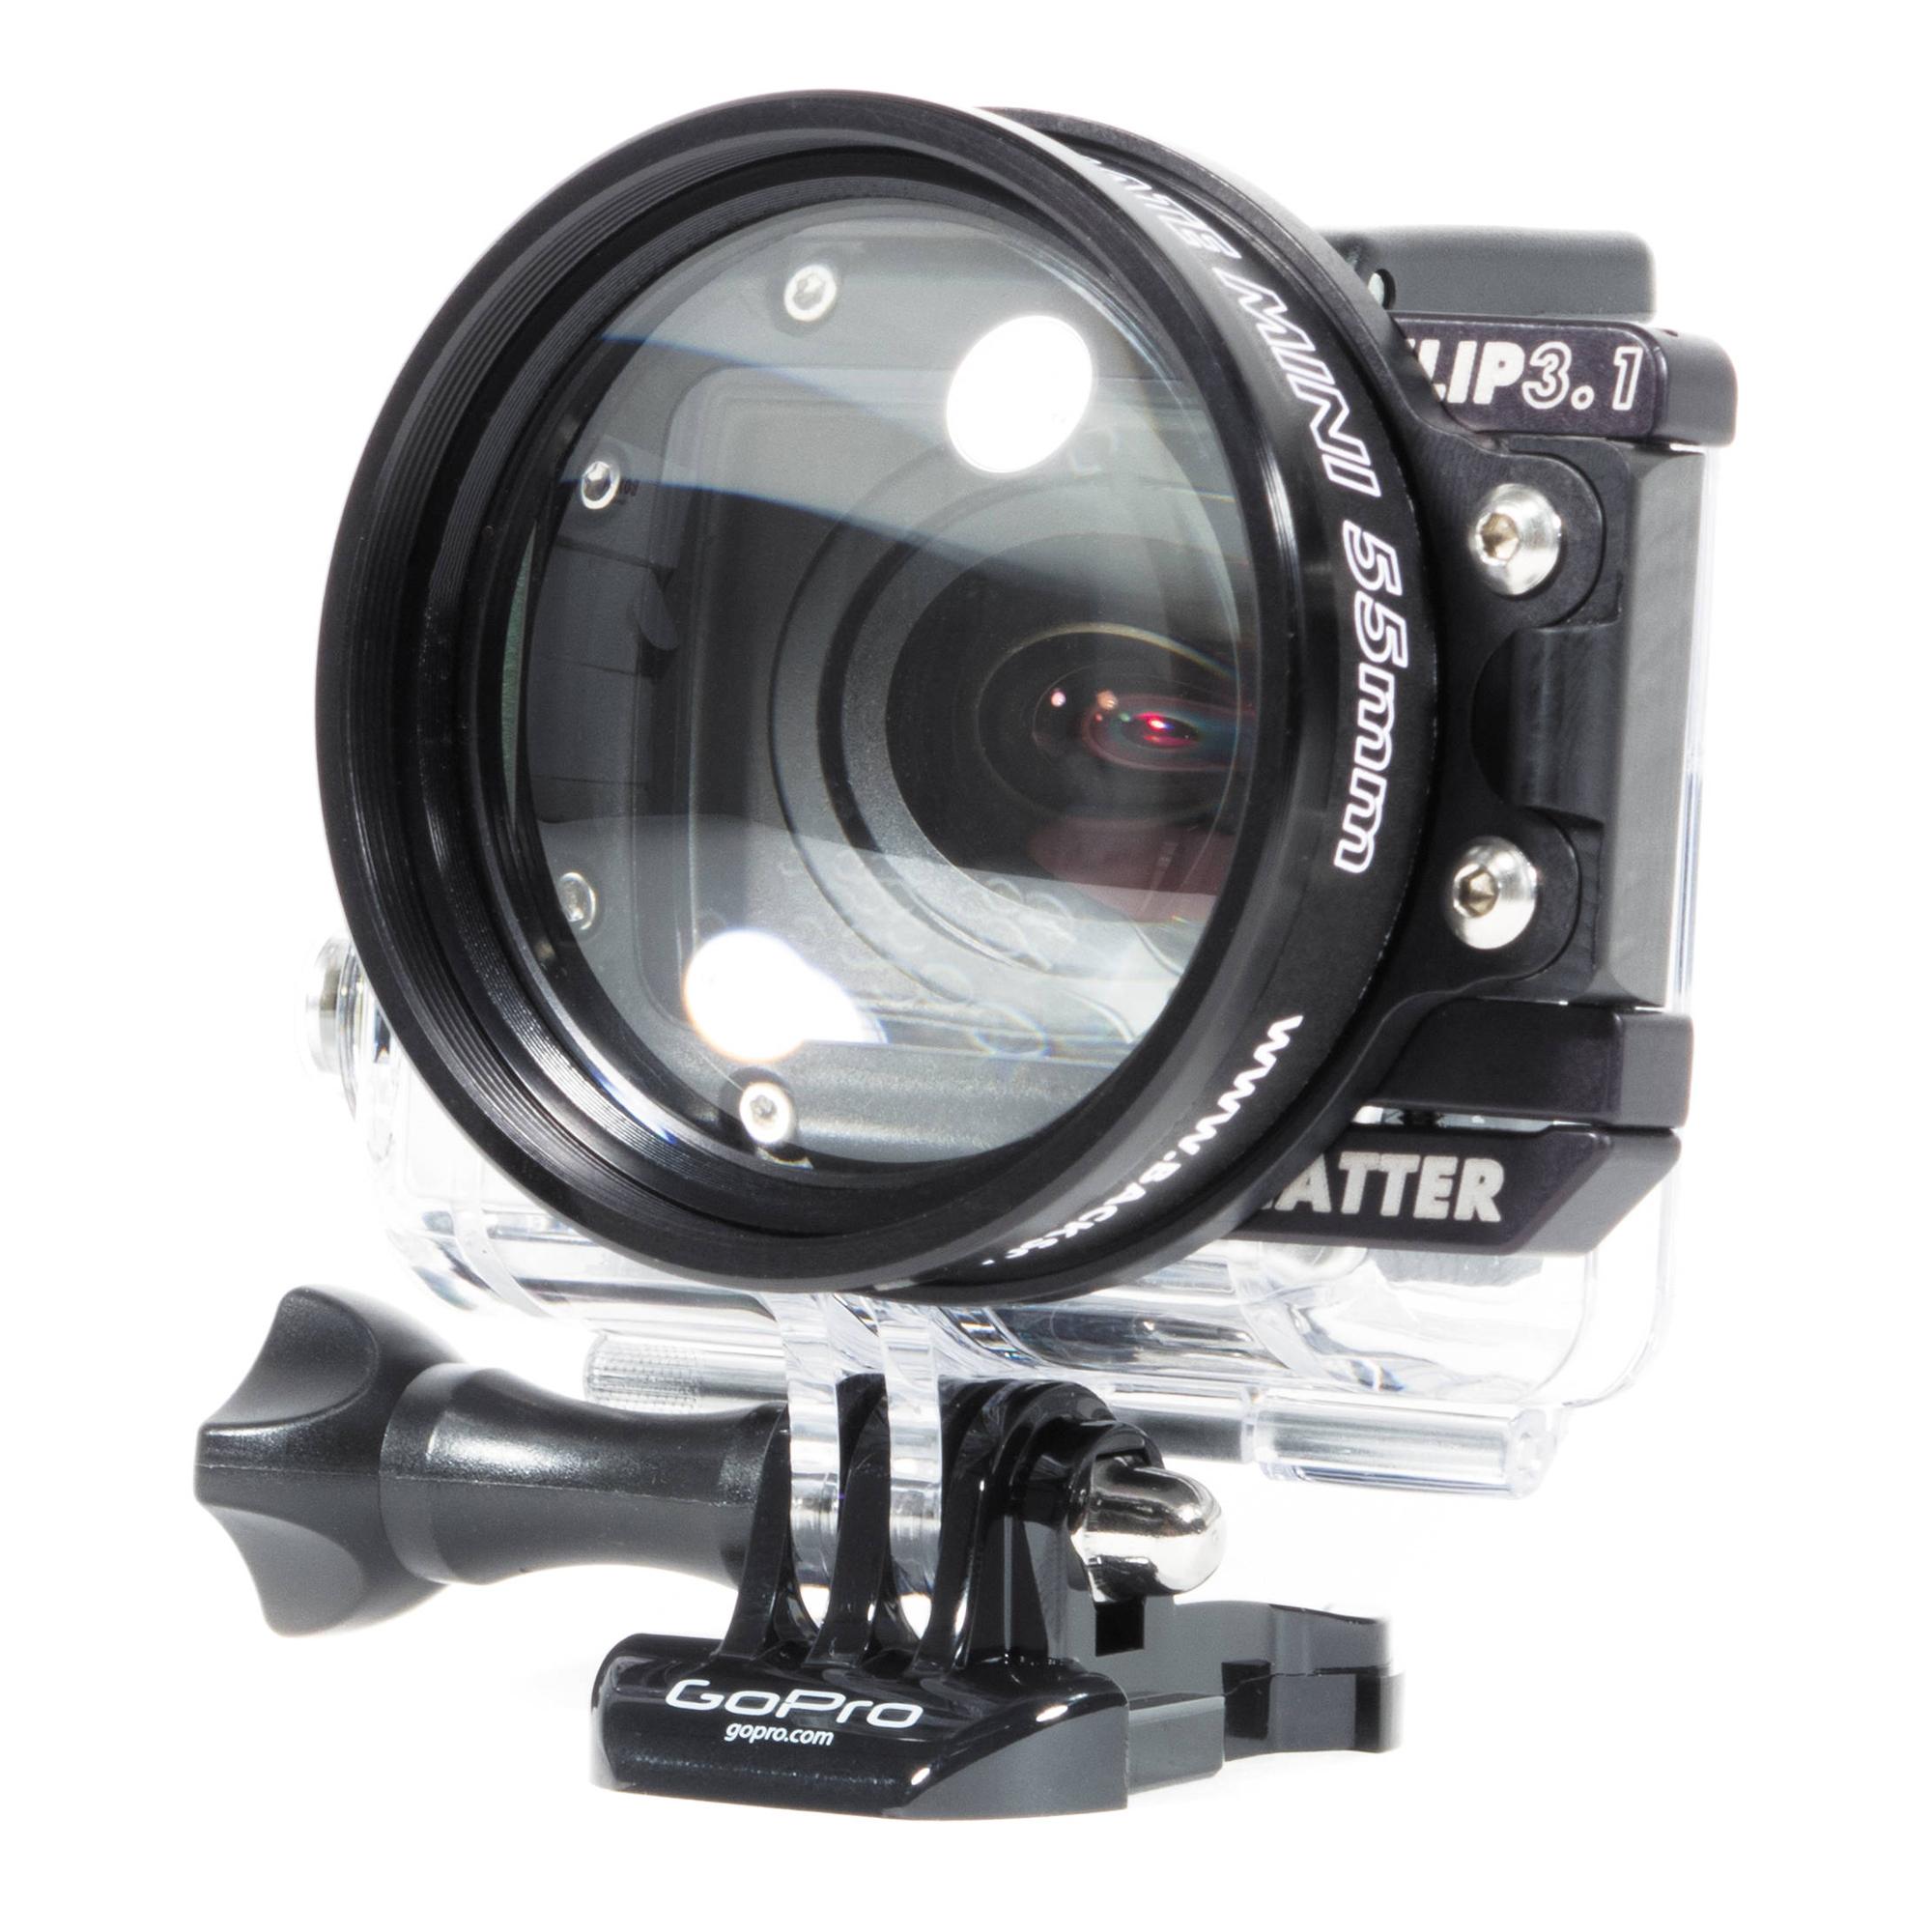 55mm Macromate Mini Underwater Macro Lens for GoPro HERO3 HERO3+